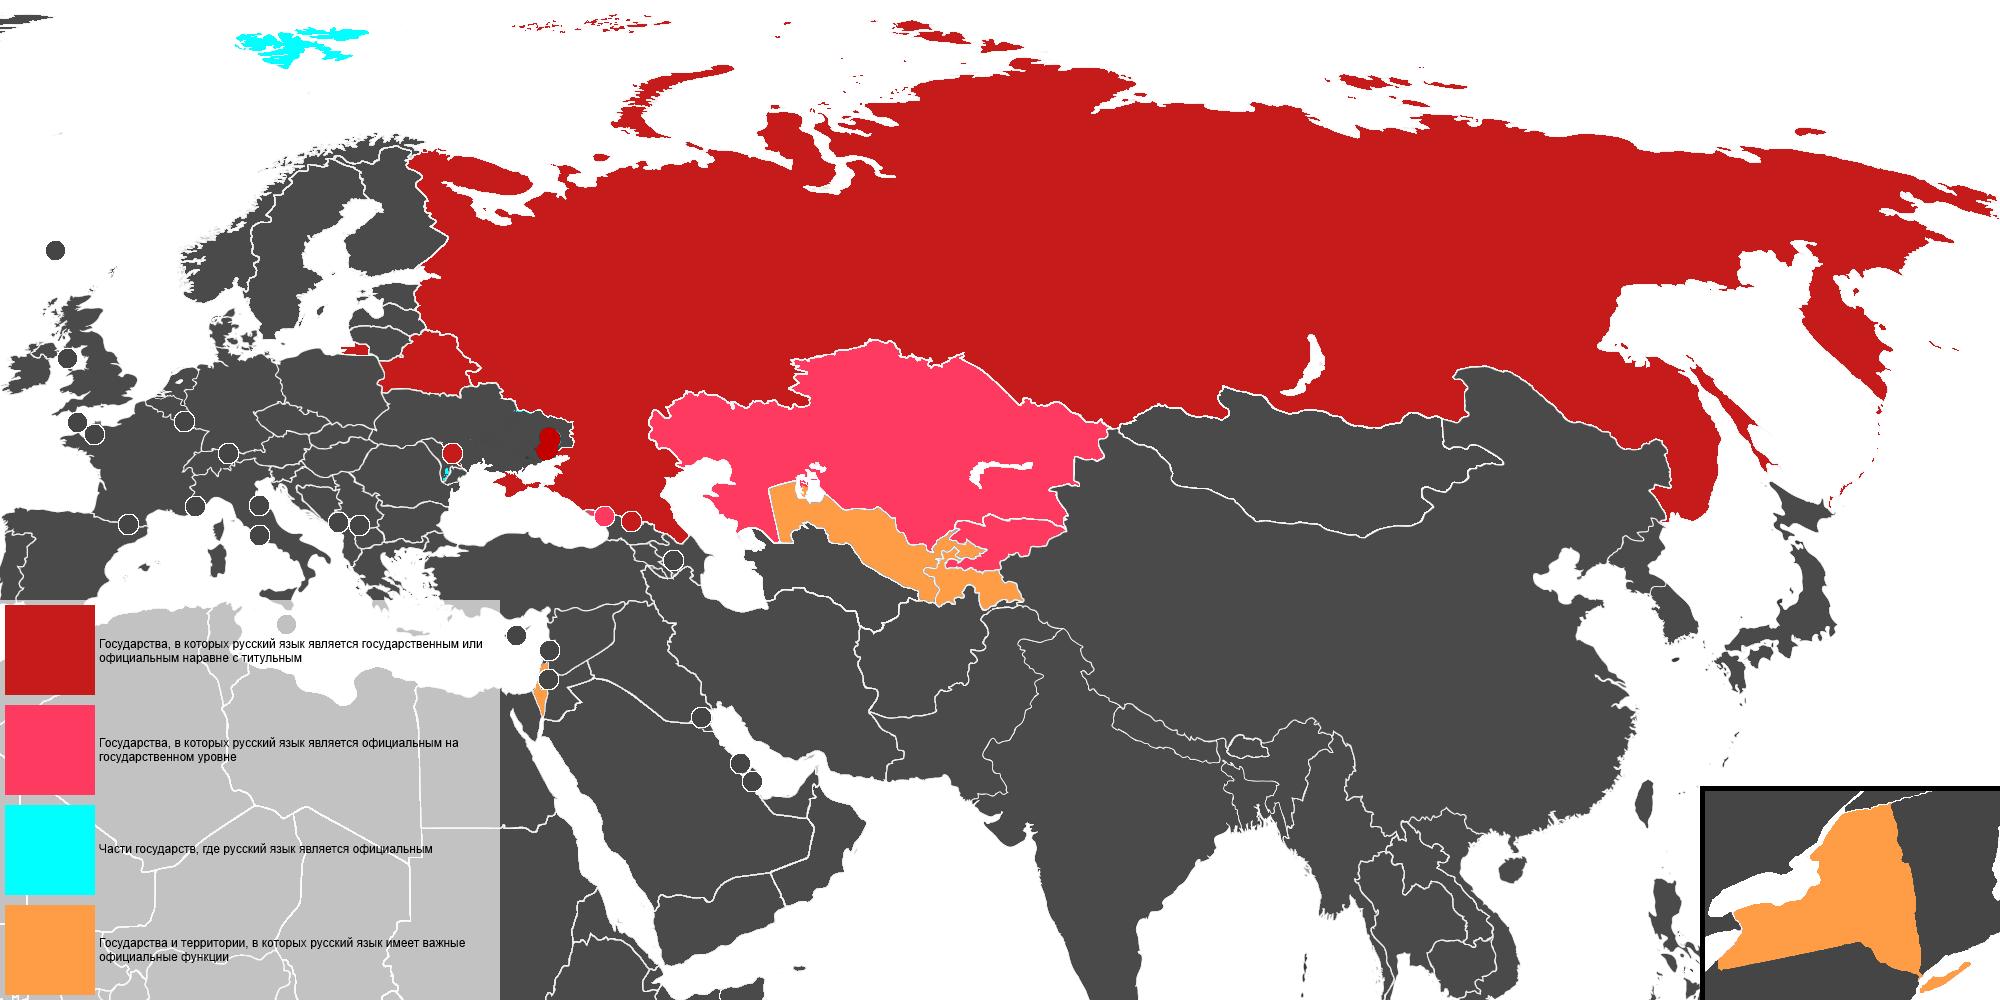 http://upload.wikimedia.org/wikipedia/ru/a/a3/RussianLanguageMap_Rus.png